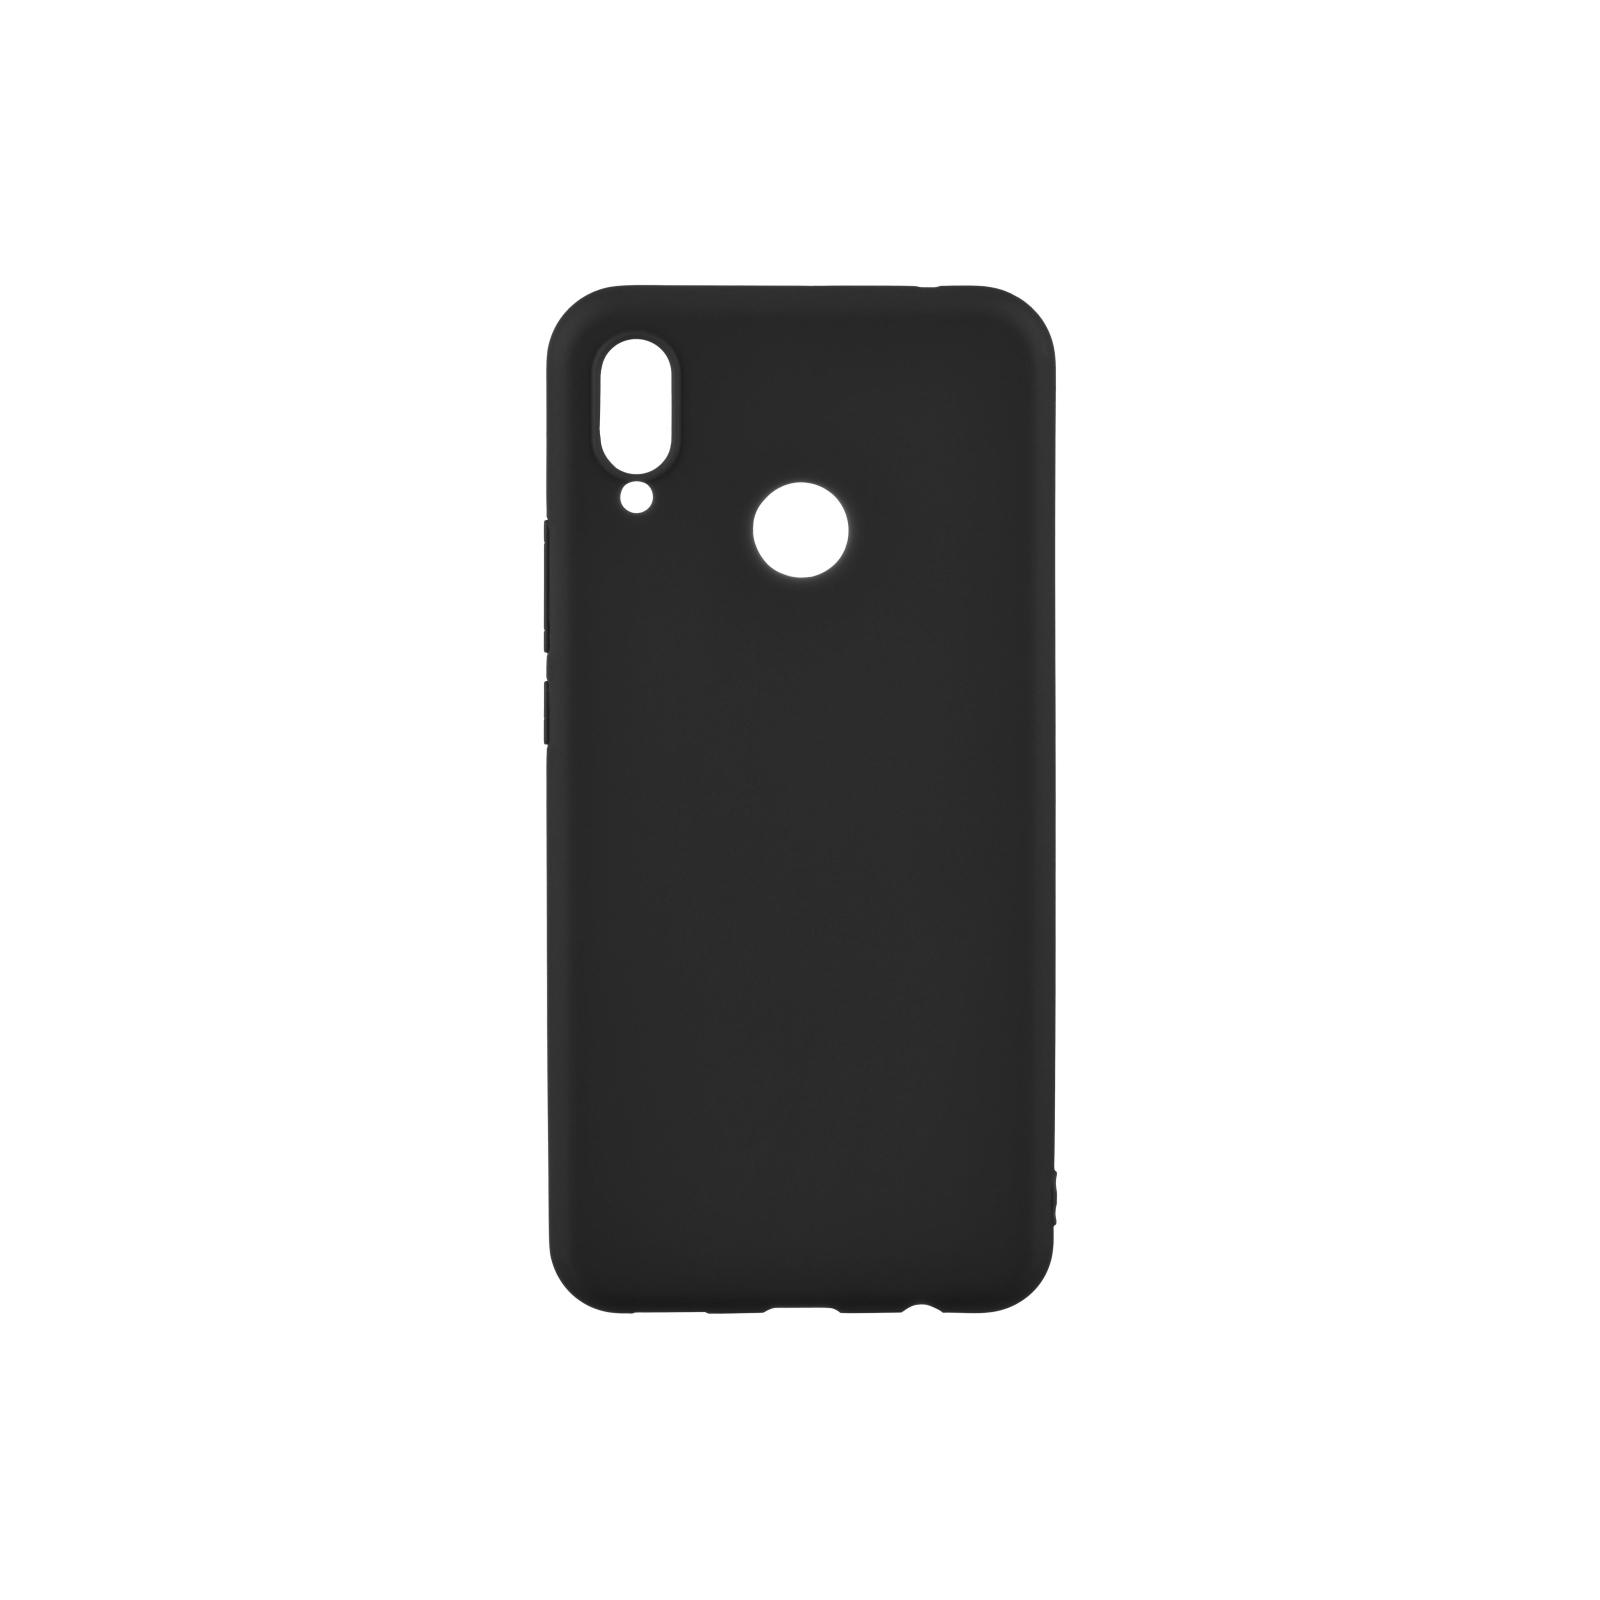 Чехол для моб. телефона 2E Huawei Y6 2018, Soft touch, Black (2E-H-Y6-18-NKST-BK)